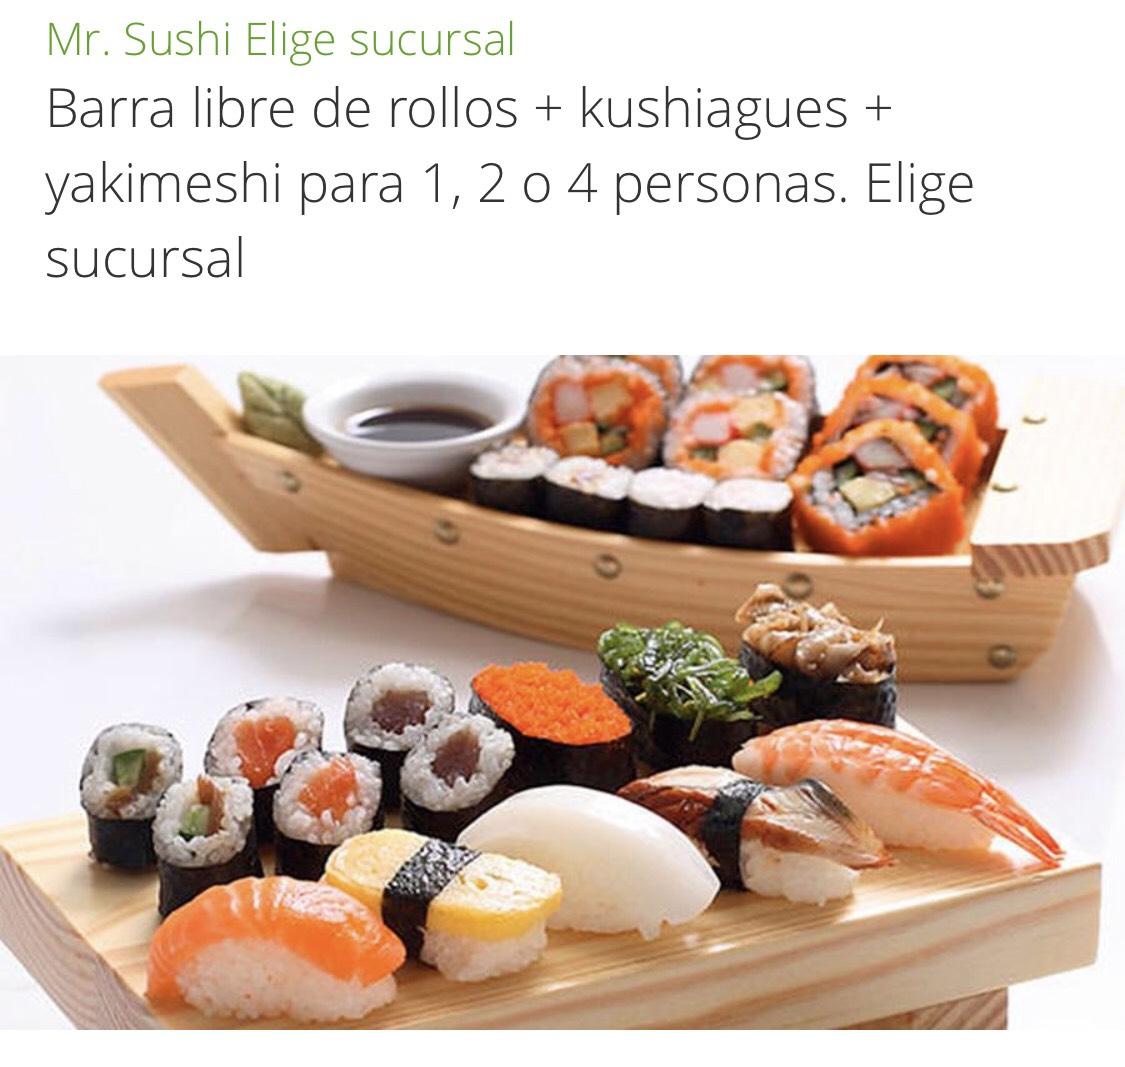 Groupon y Mr. Sushi CDMX:  Barra libre de rollos + kushiagues + yakimeshi para 1, 2 o 4 personas.